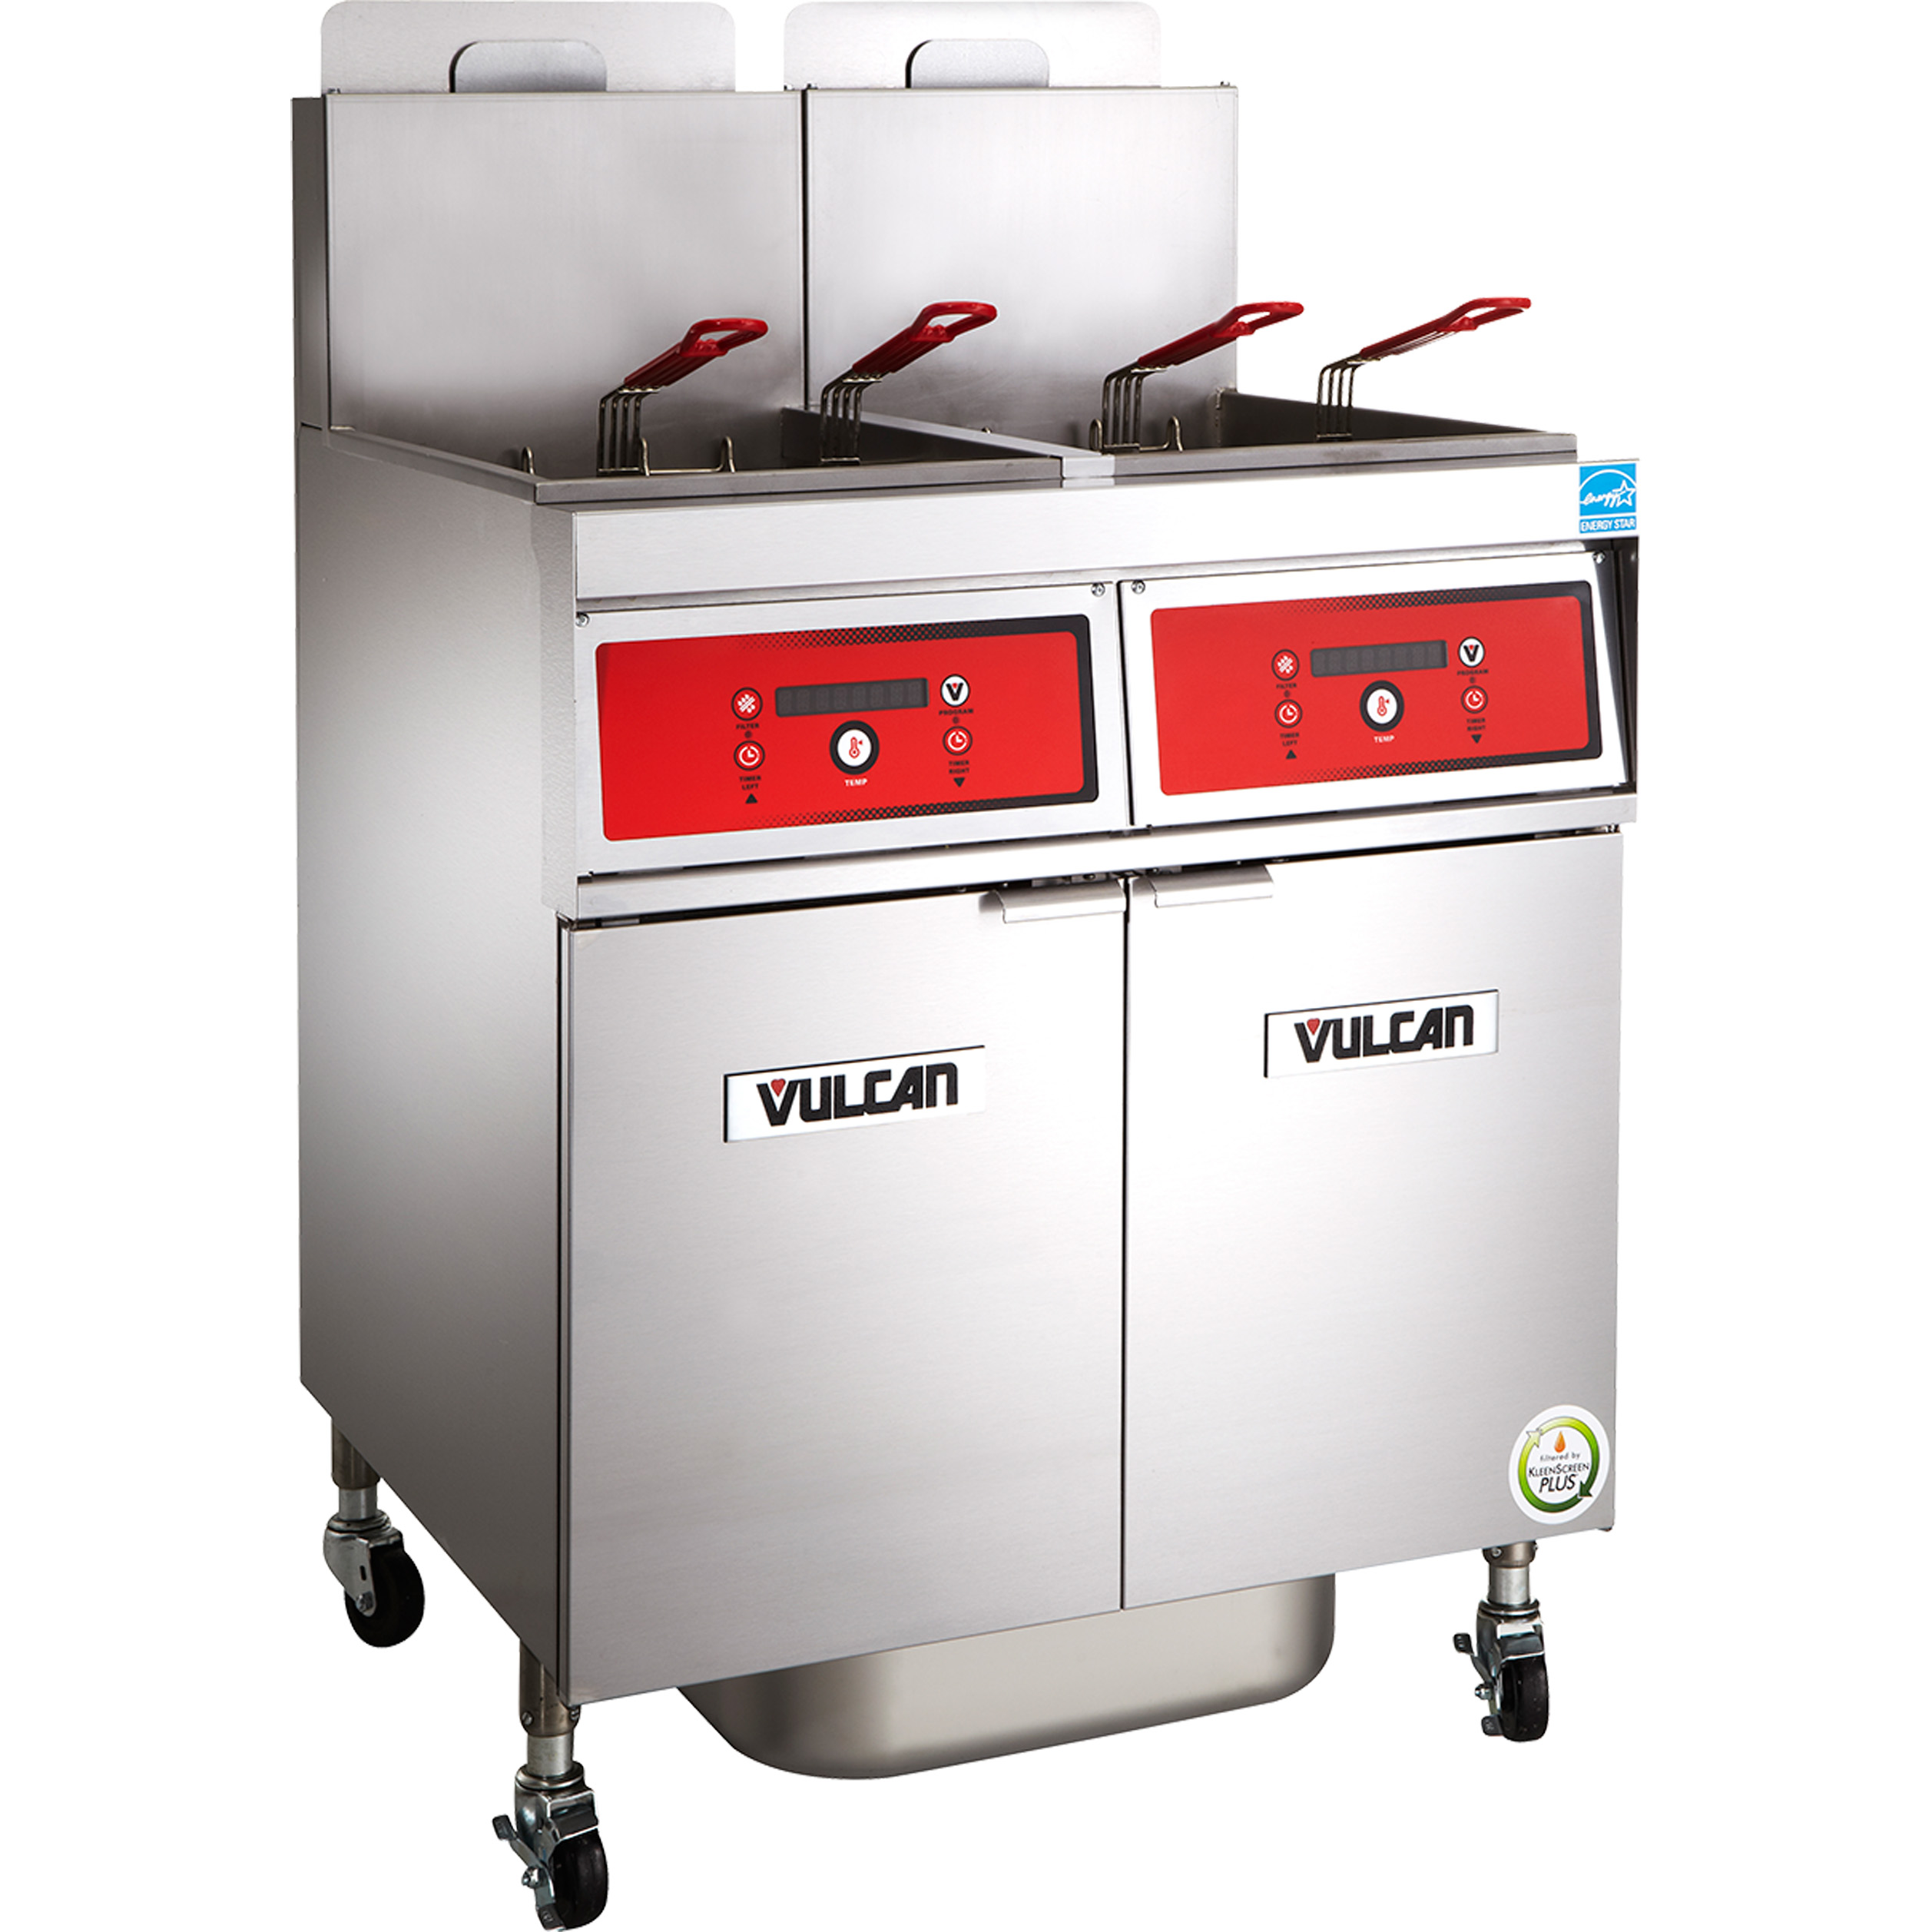 Vulcan 4VK45DF fryer, gas, multiple battery